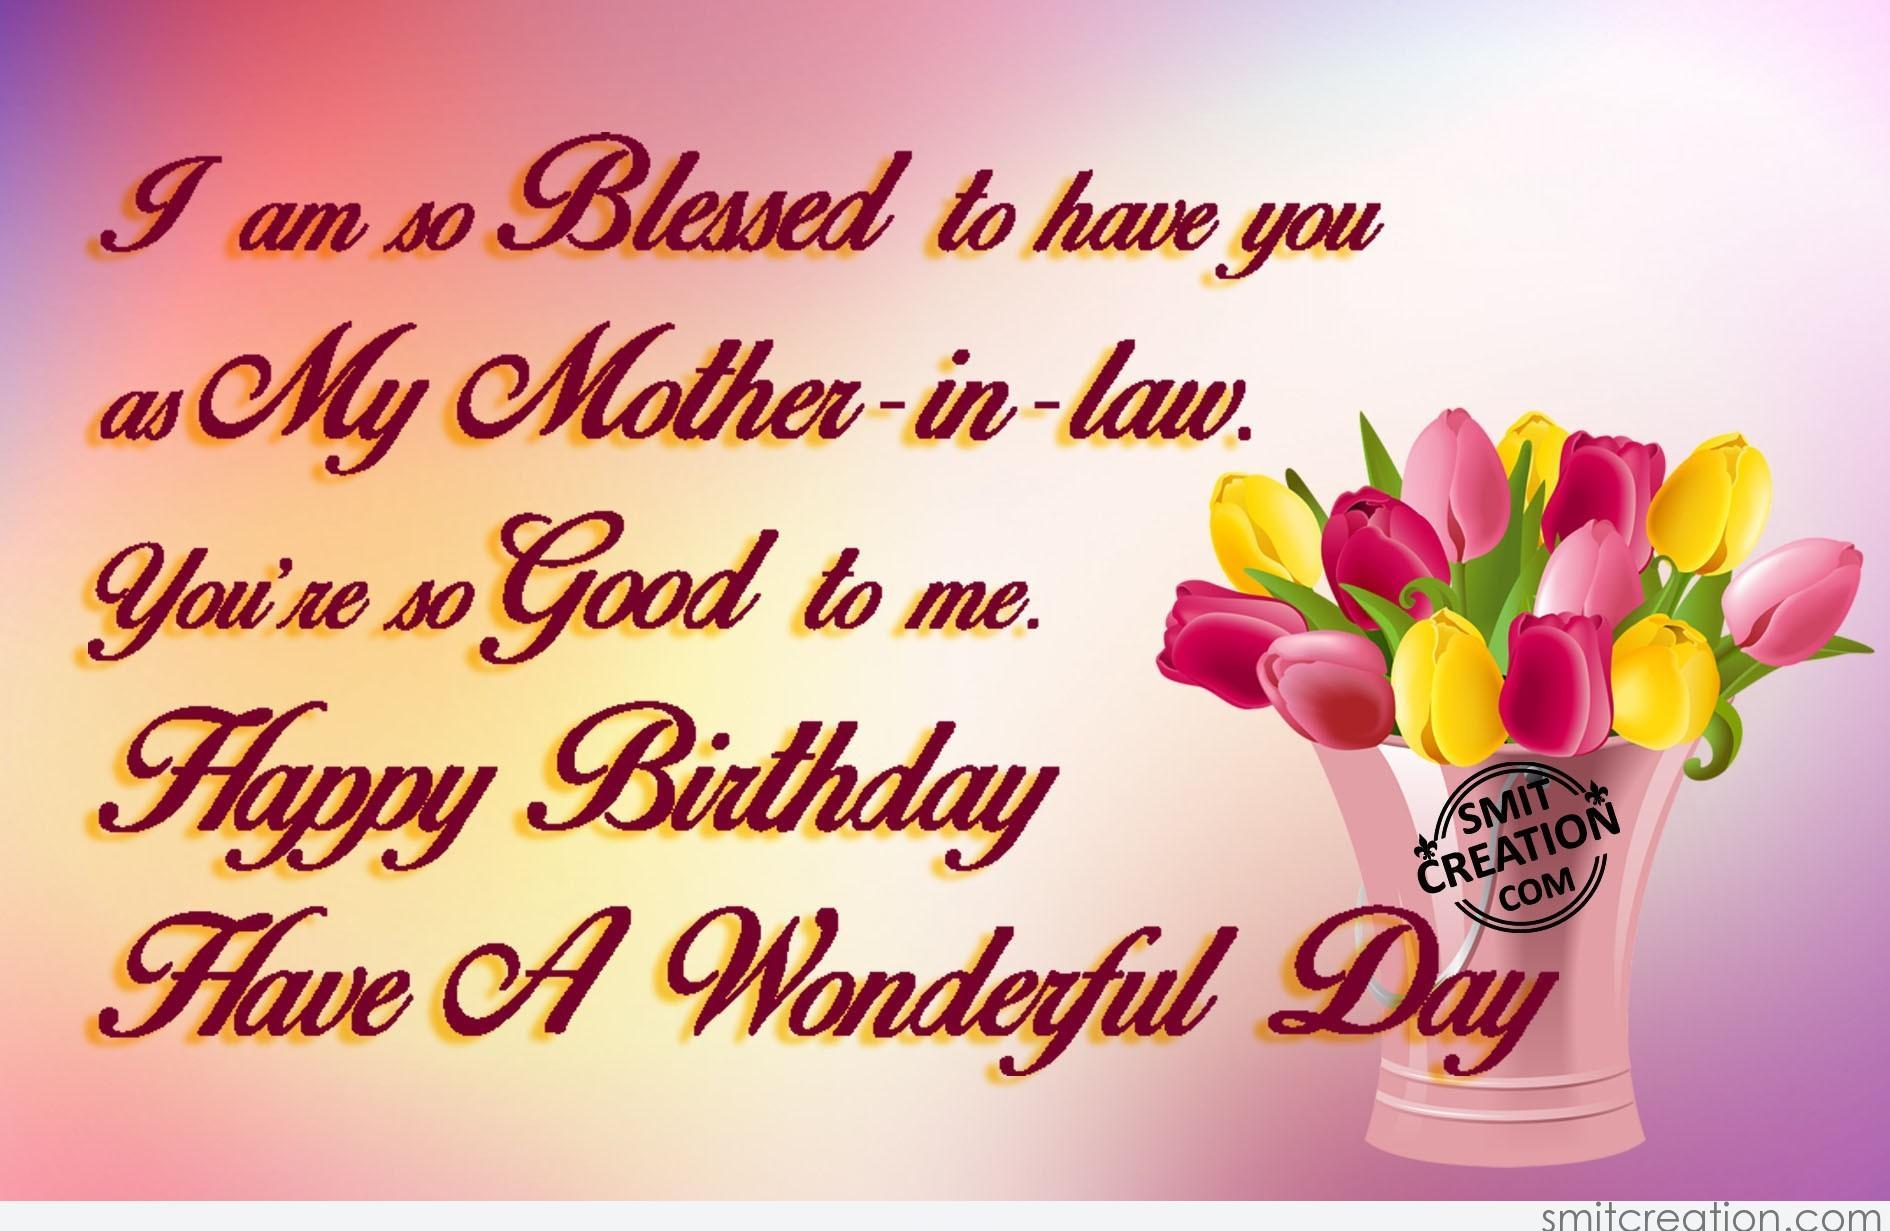 Happy Birthday Mother In Law Smitcreation Com